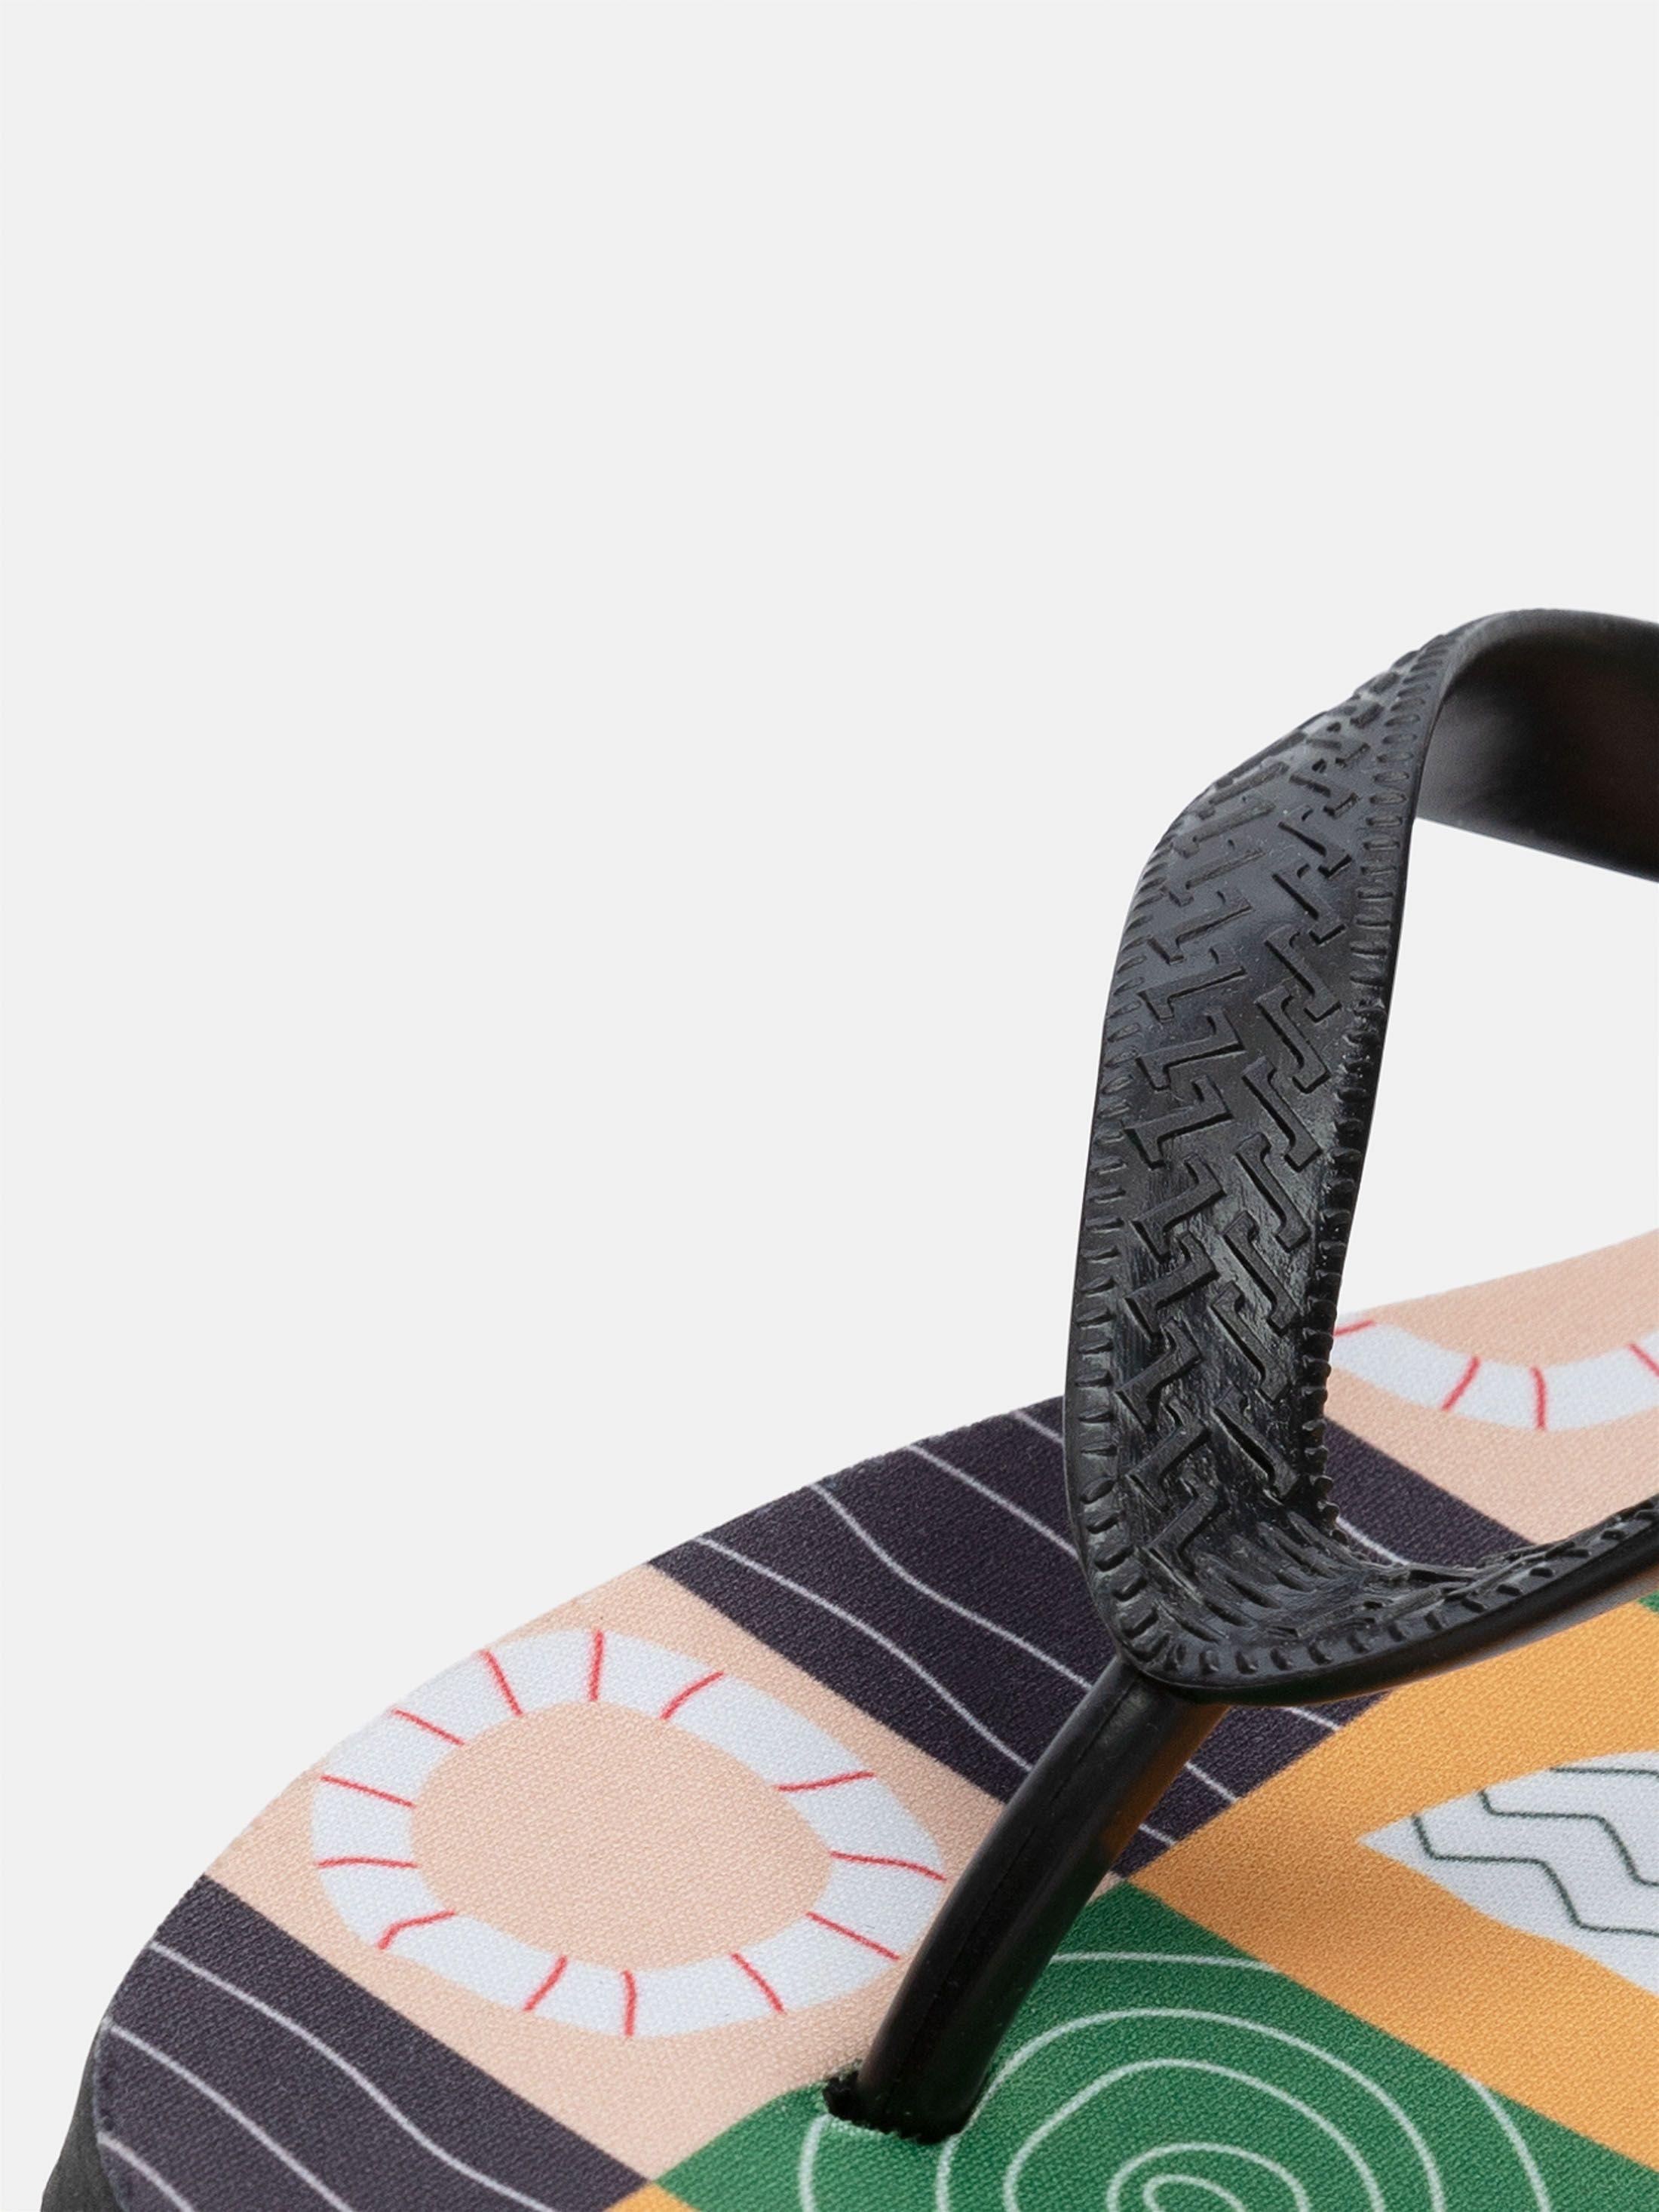 Designa egna flip-flop